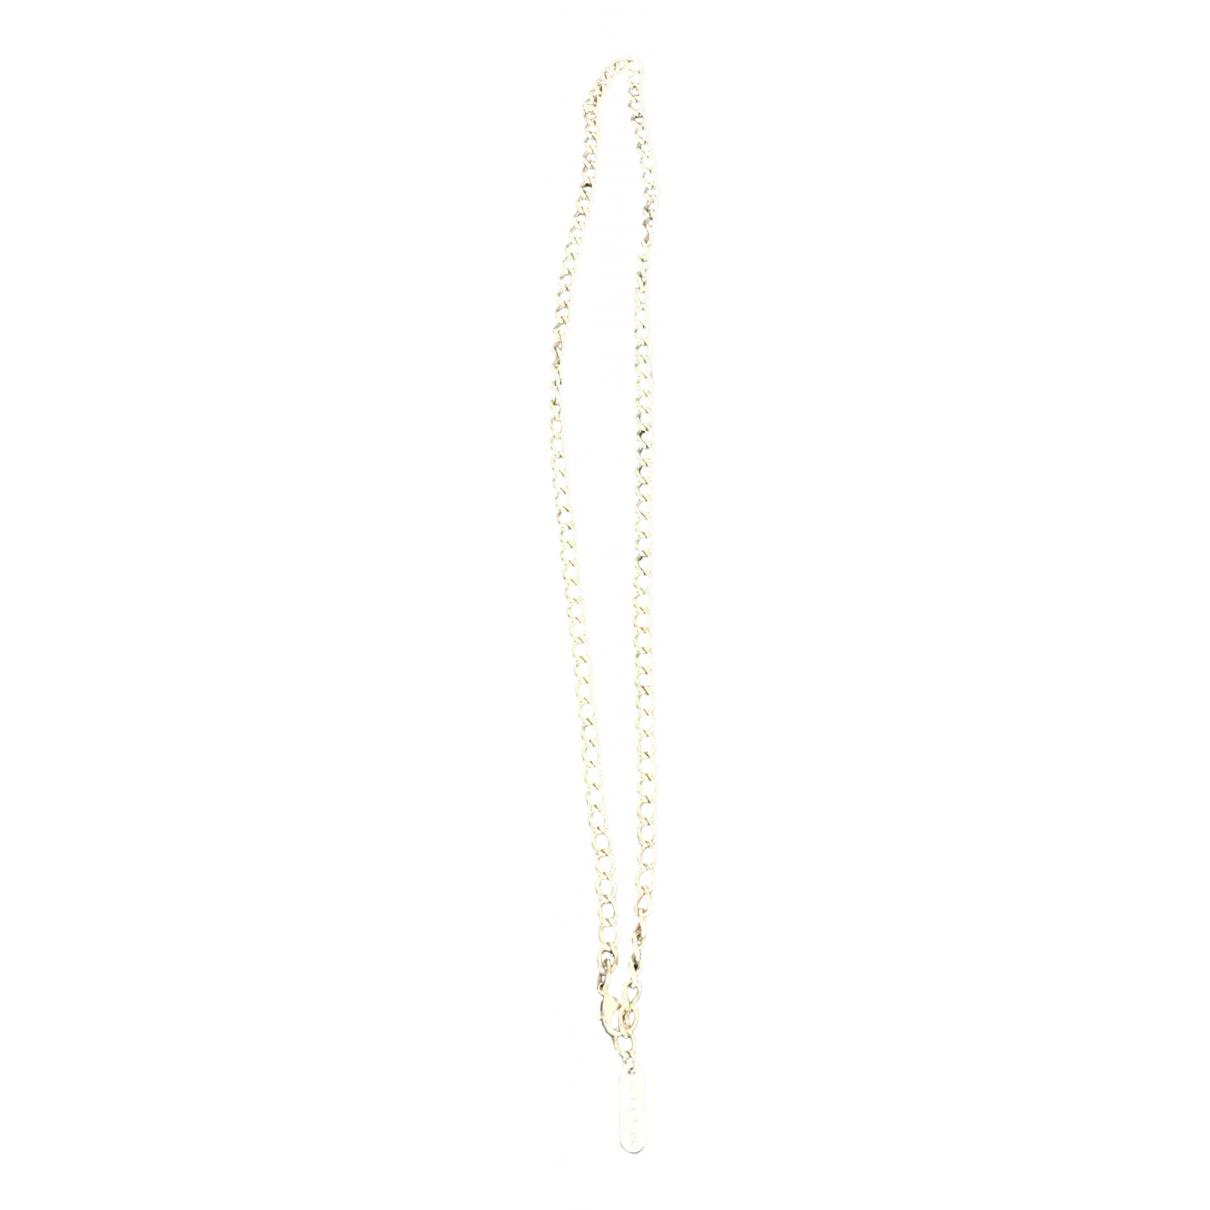 Collar Chaines Non Signe / Unsigned